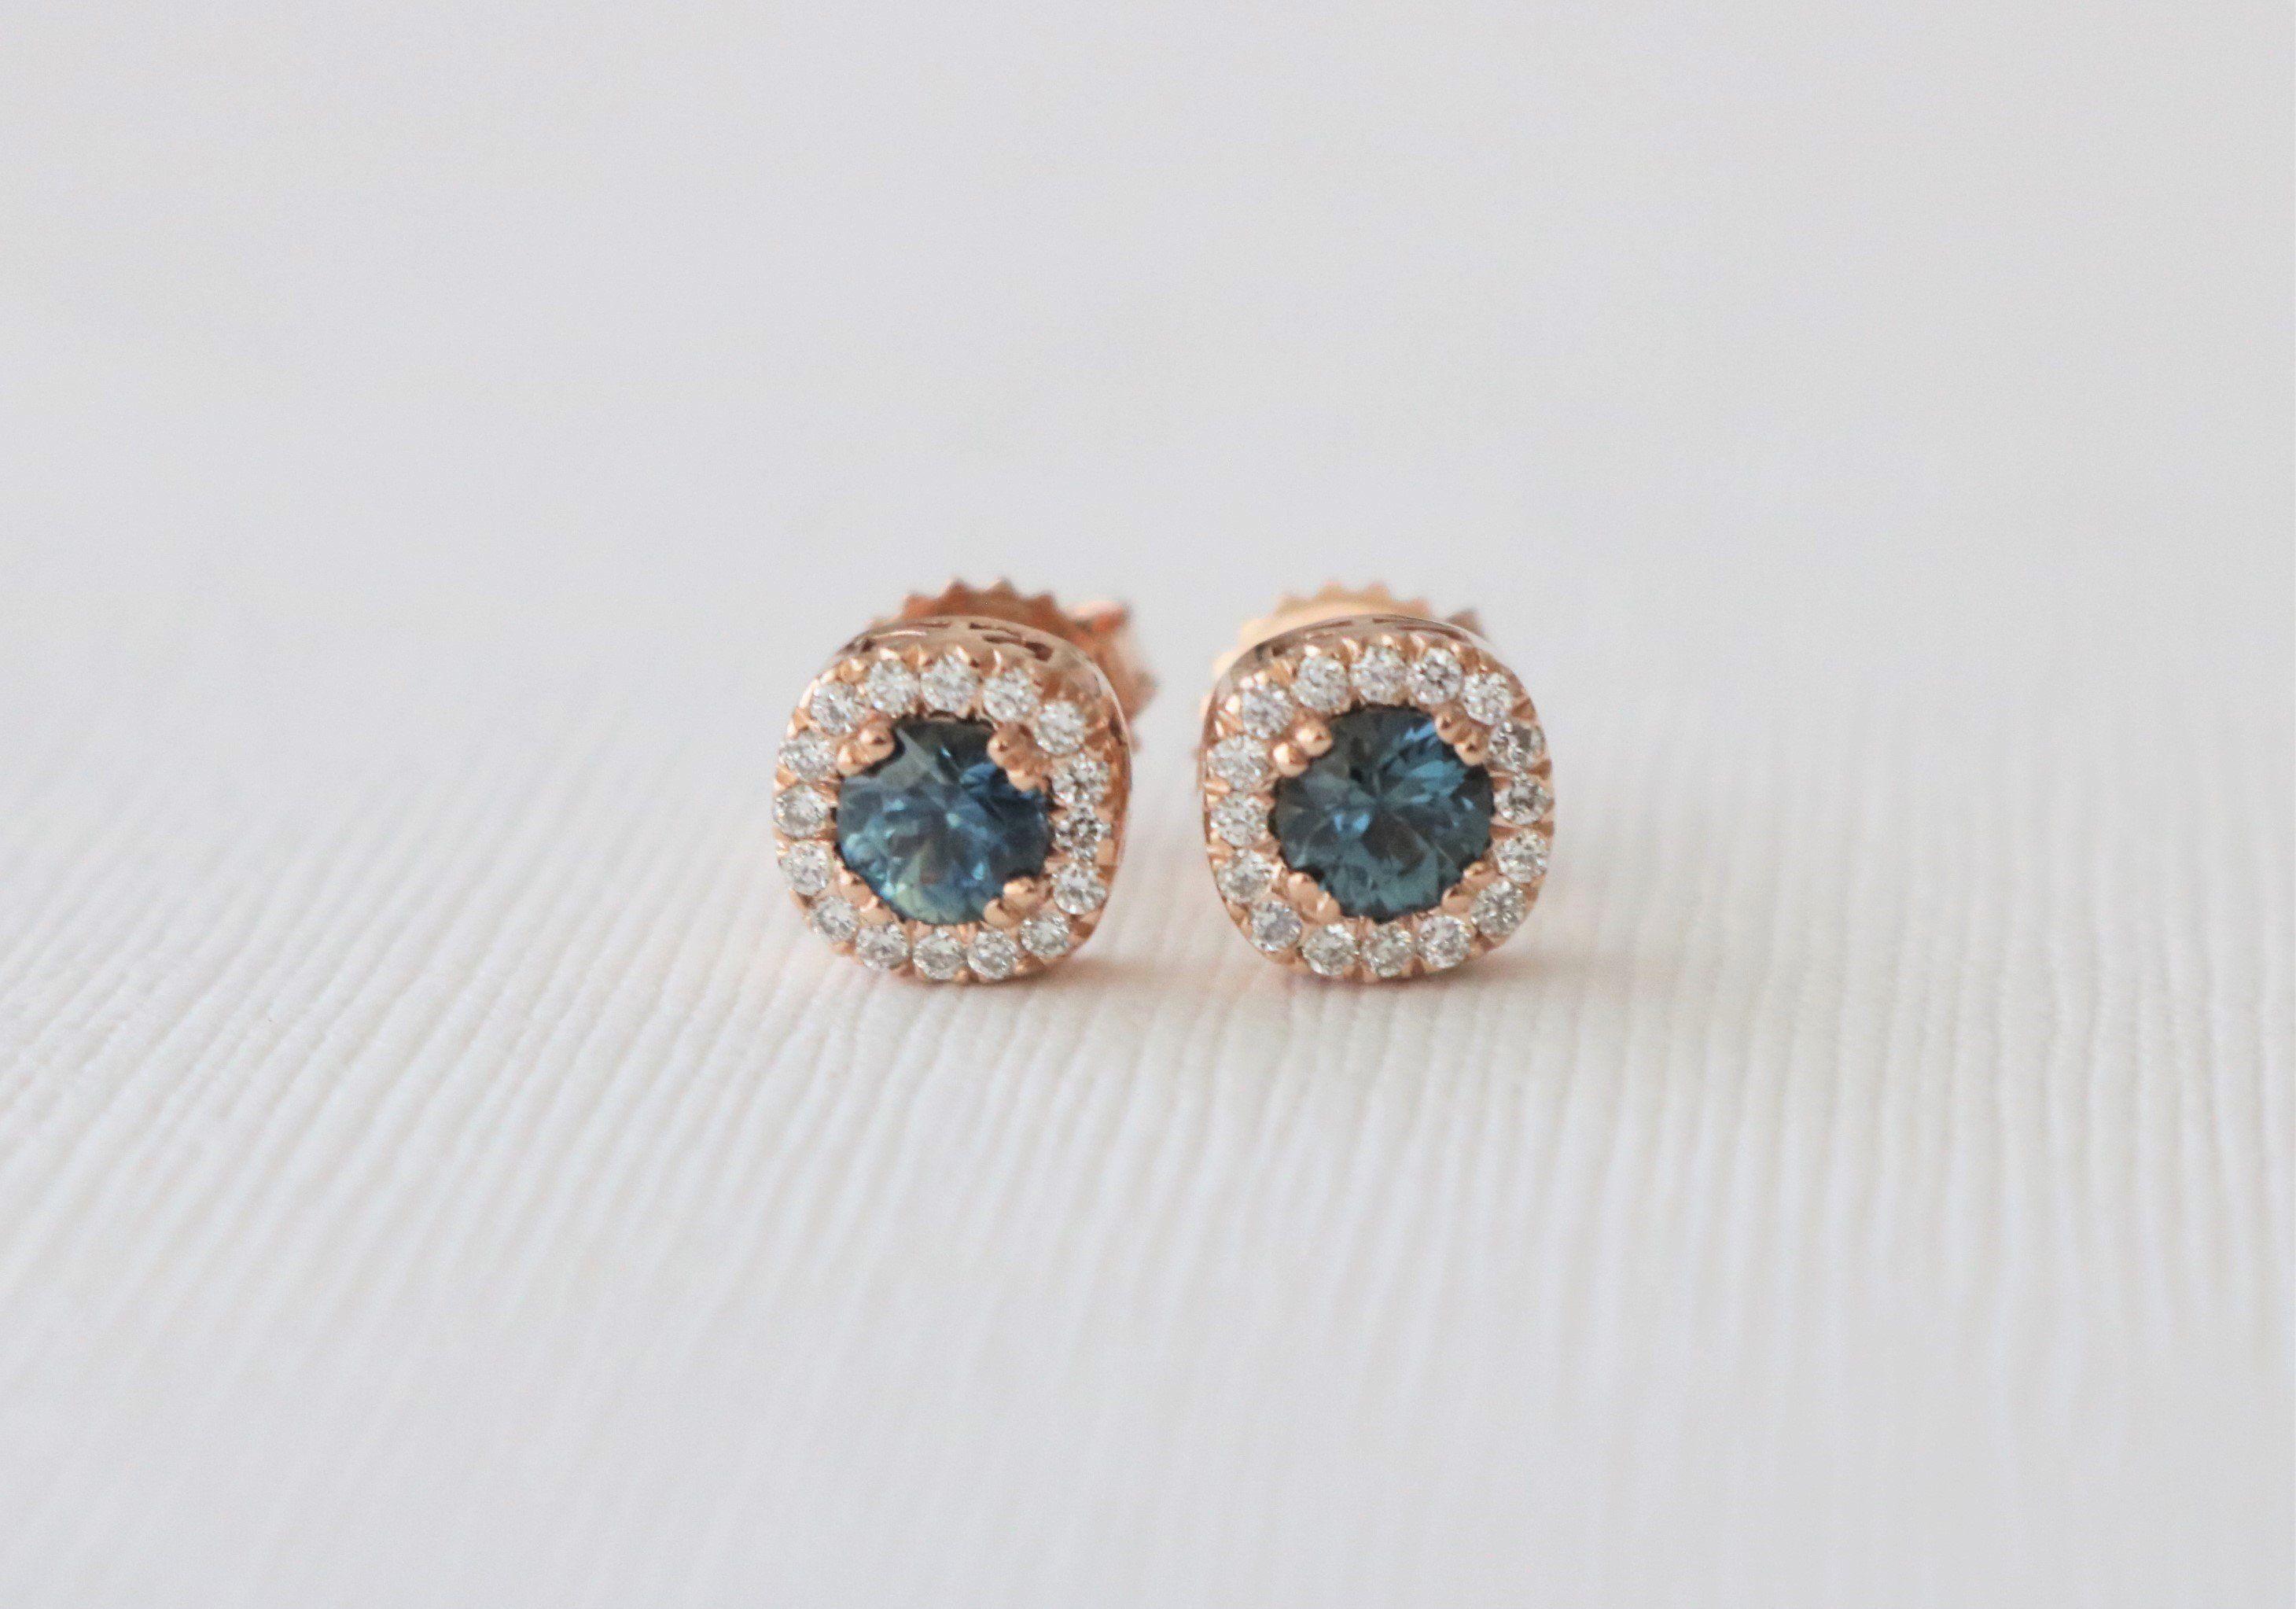 Etsy 0 25 Carat Diamond 14K Rose Gold Stud Earrings